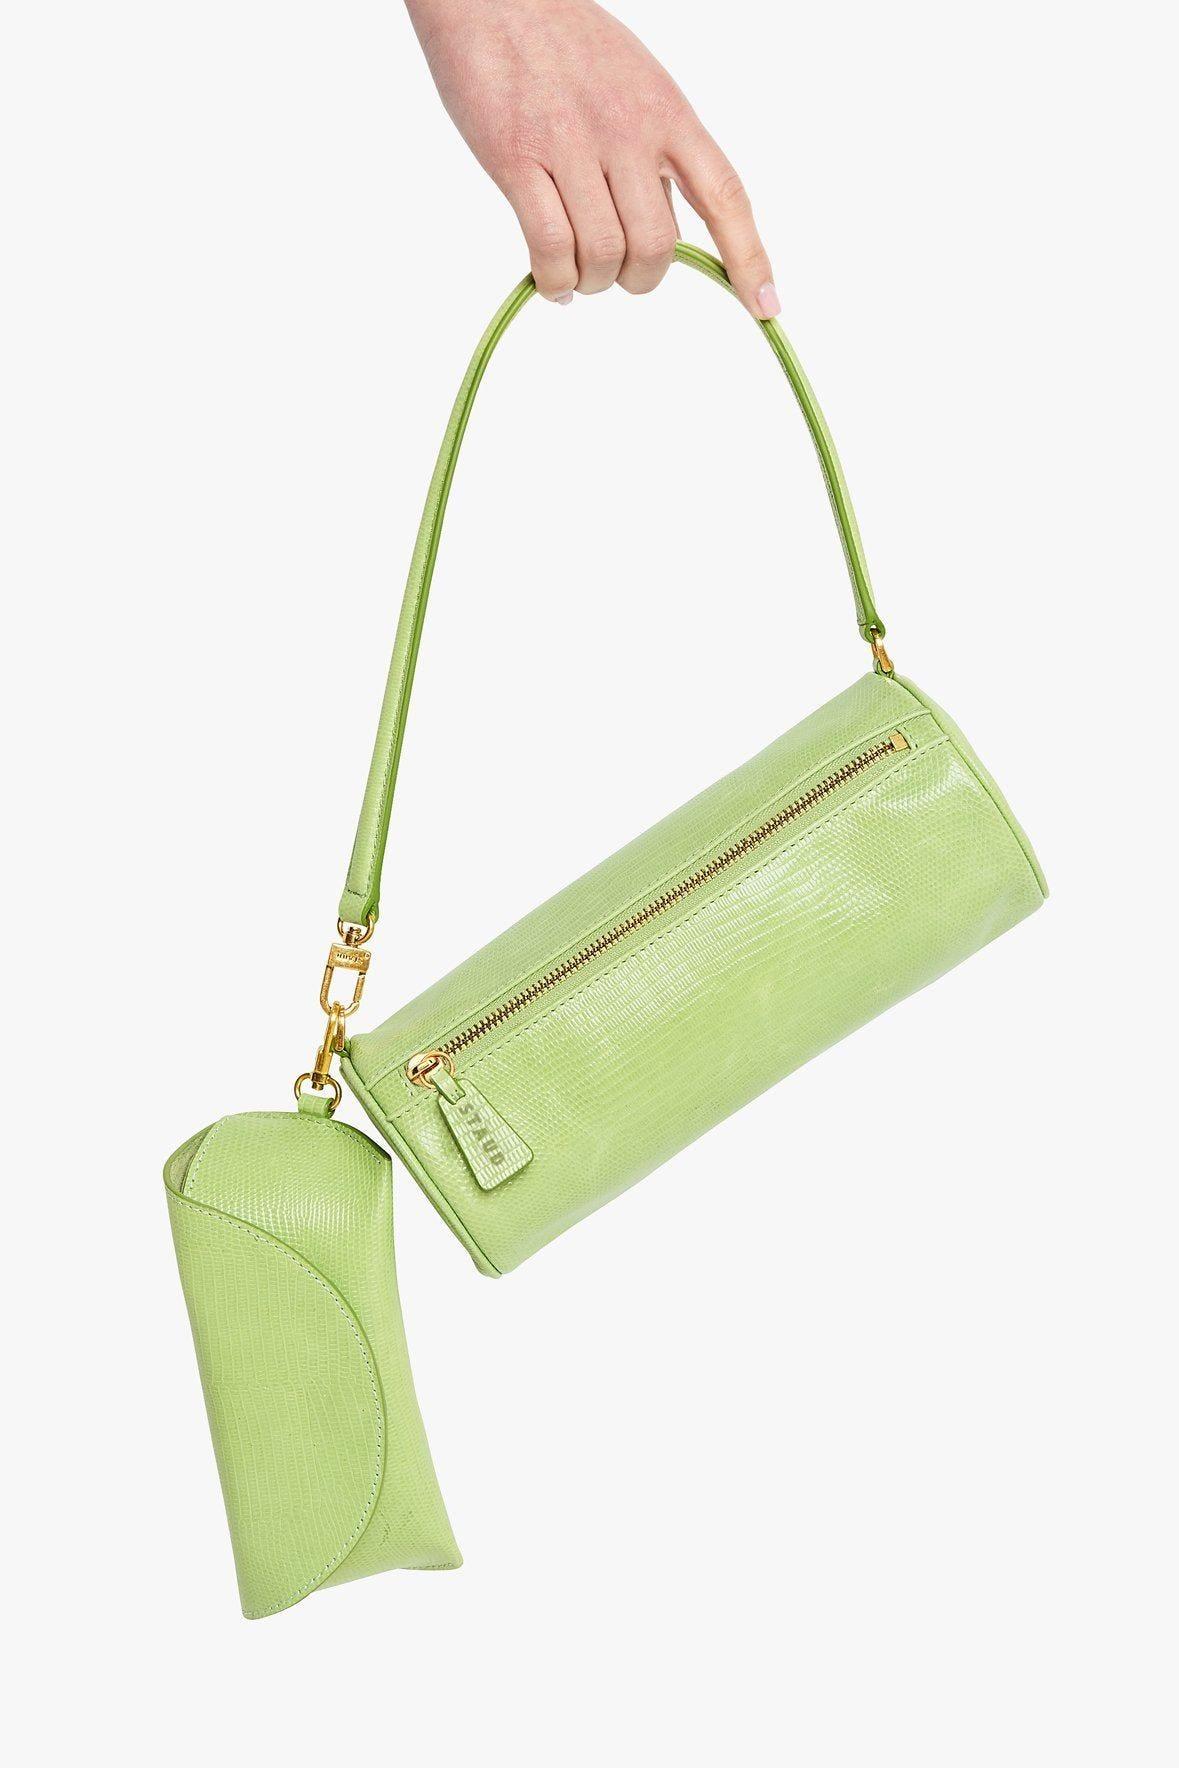 224c61627 Summer Handbag Trends 2019 Best Bags For Work & Play